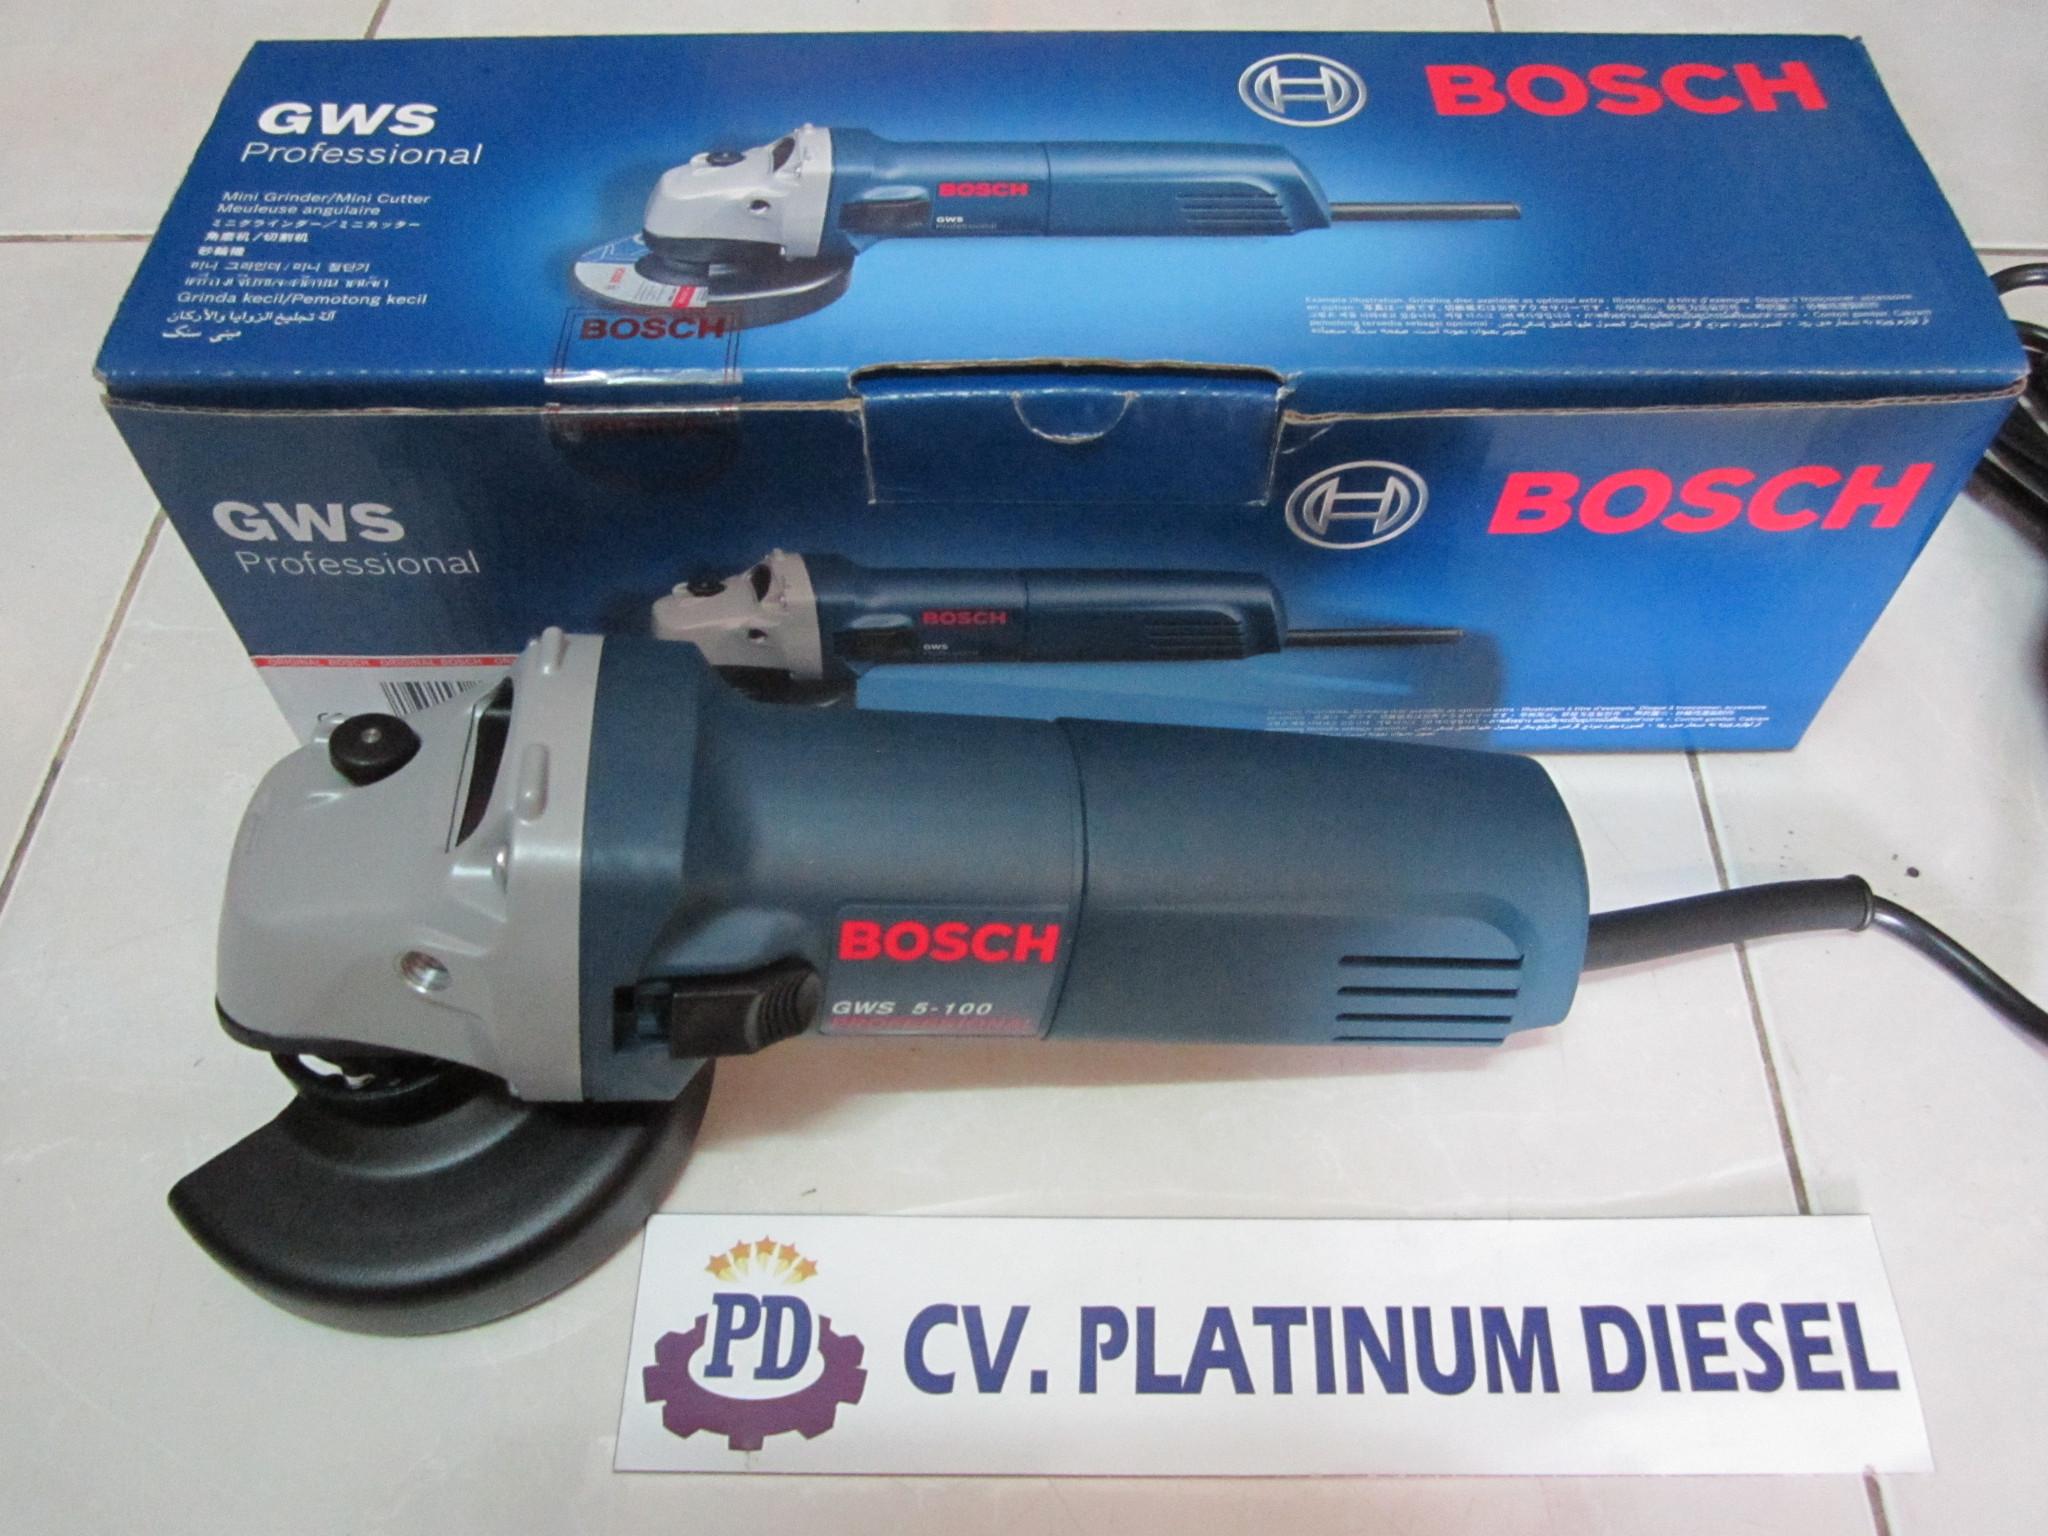 Harga Bosch Gws 5 100 Mesin Gerinda Tangan 4 Biru Indonesia Bot Source .